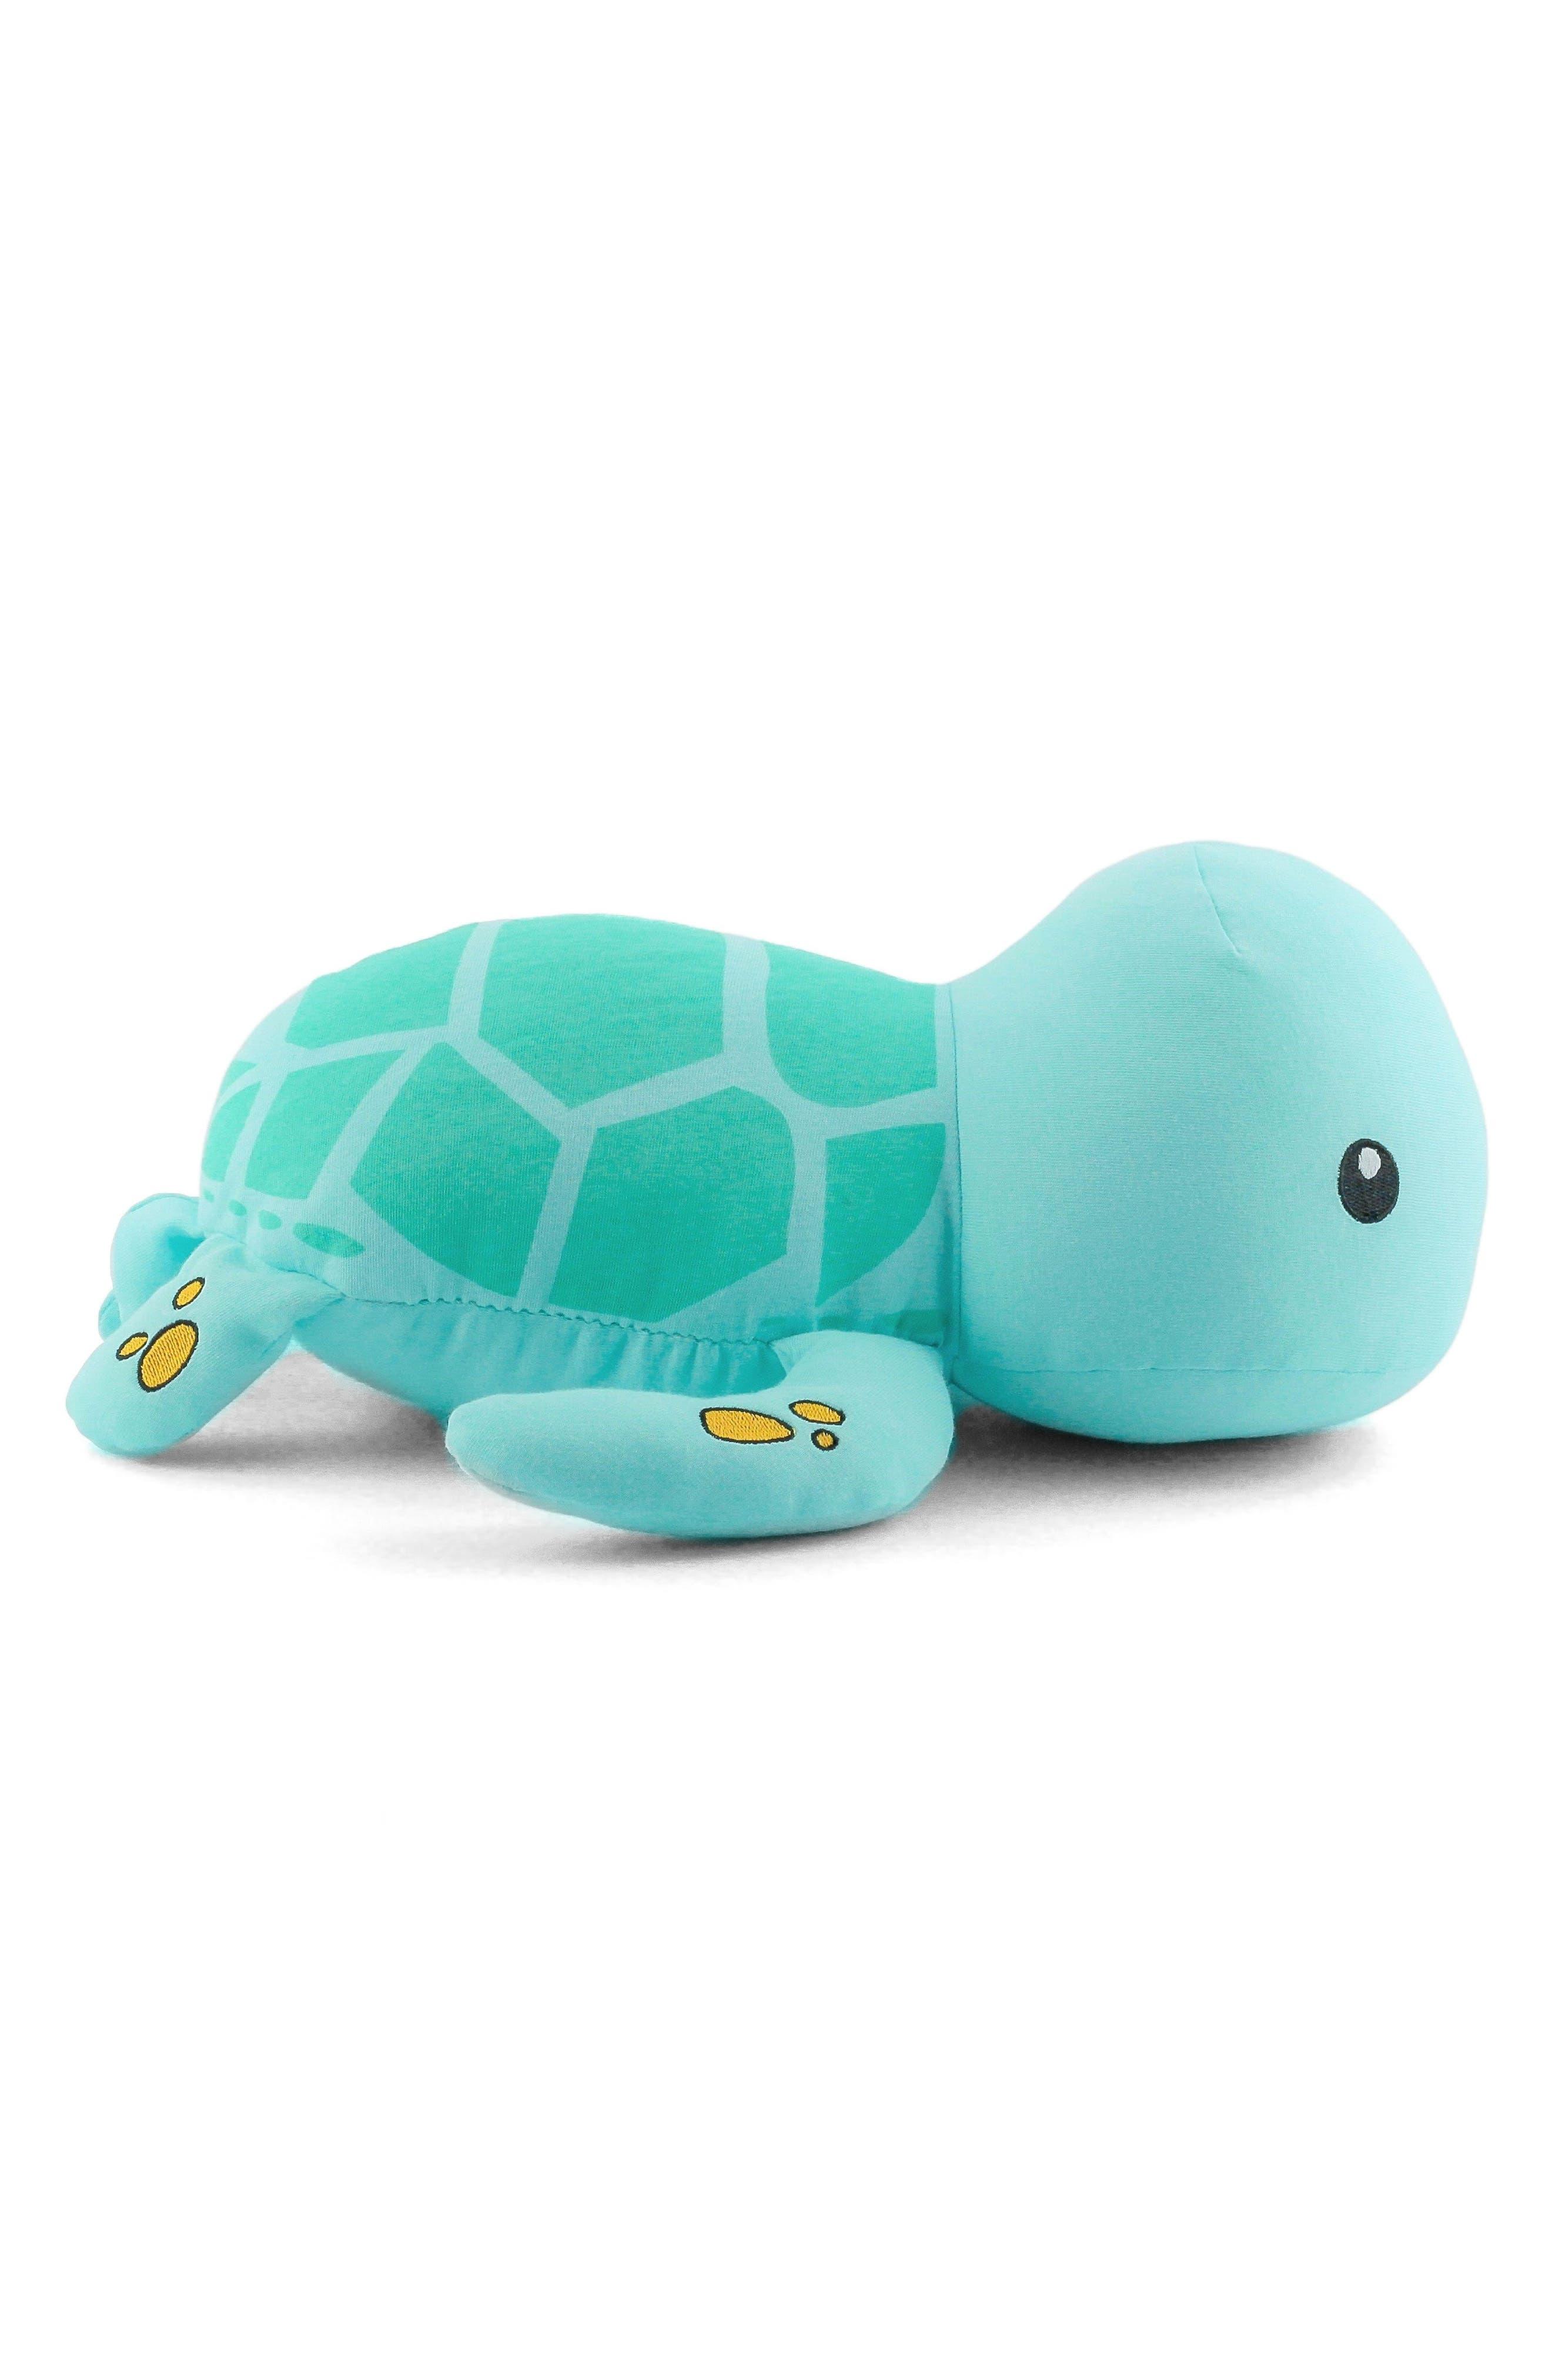 Tucker Turtle Stuffed Animal,                             Main thumbnail 1, color,                             Blue/ Green